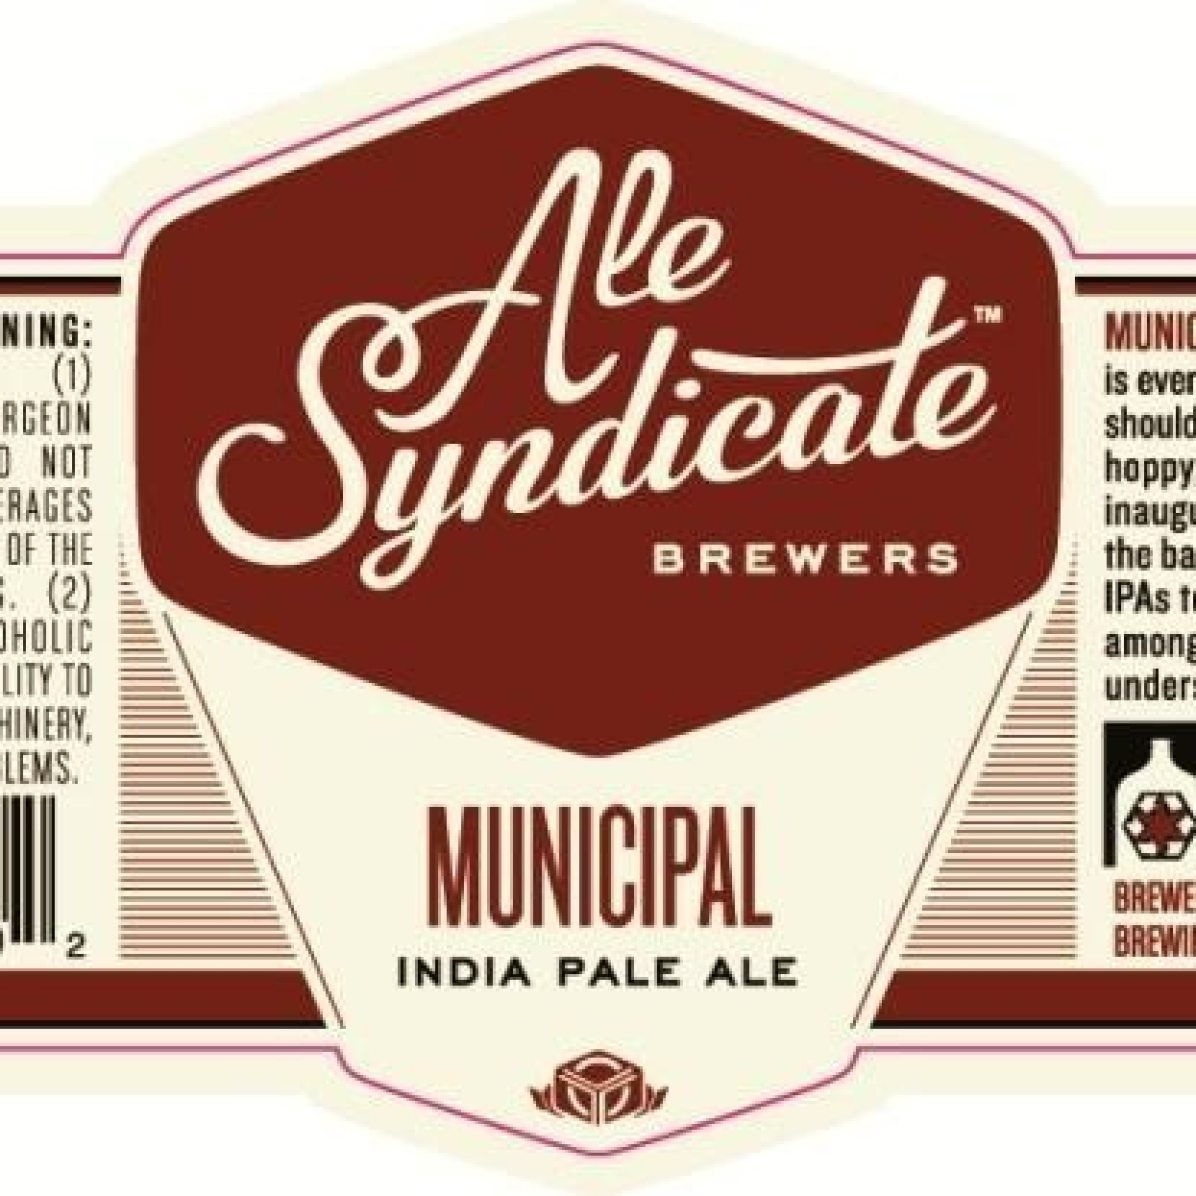 Ale Syndicate Municipal India Pale Ale